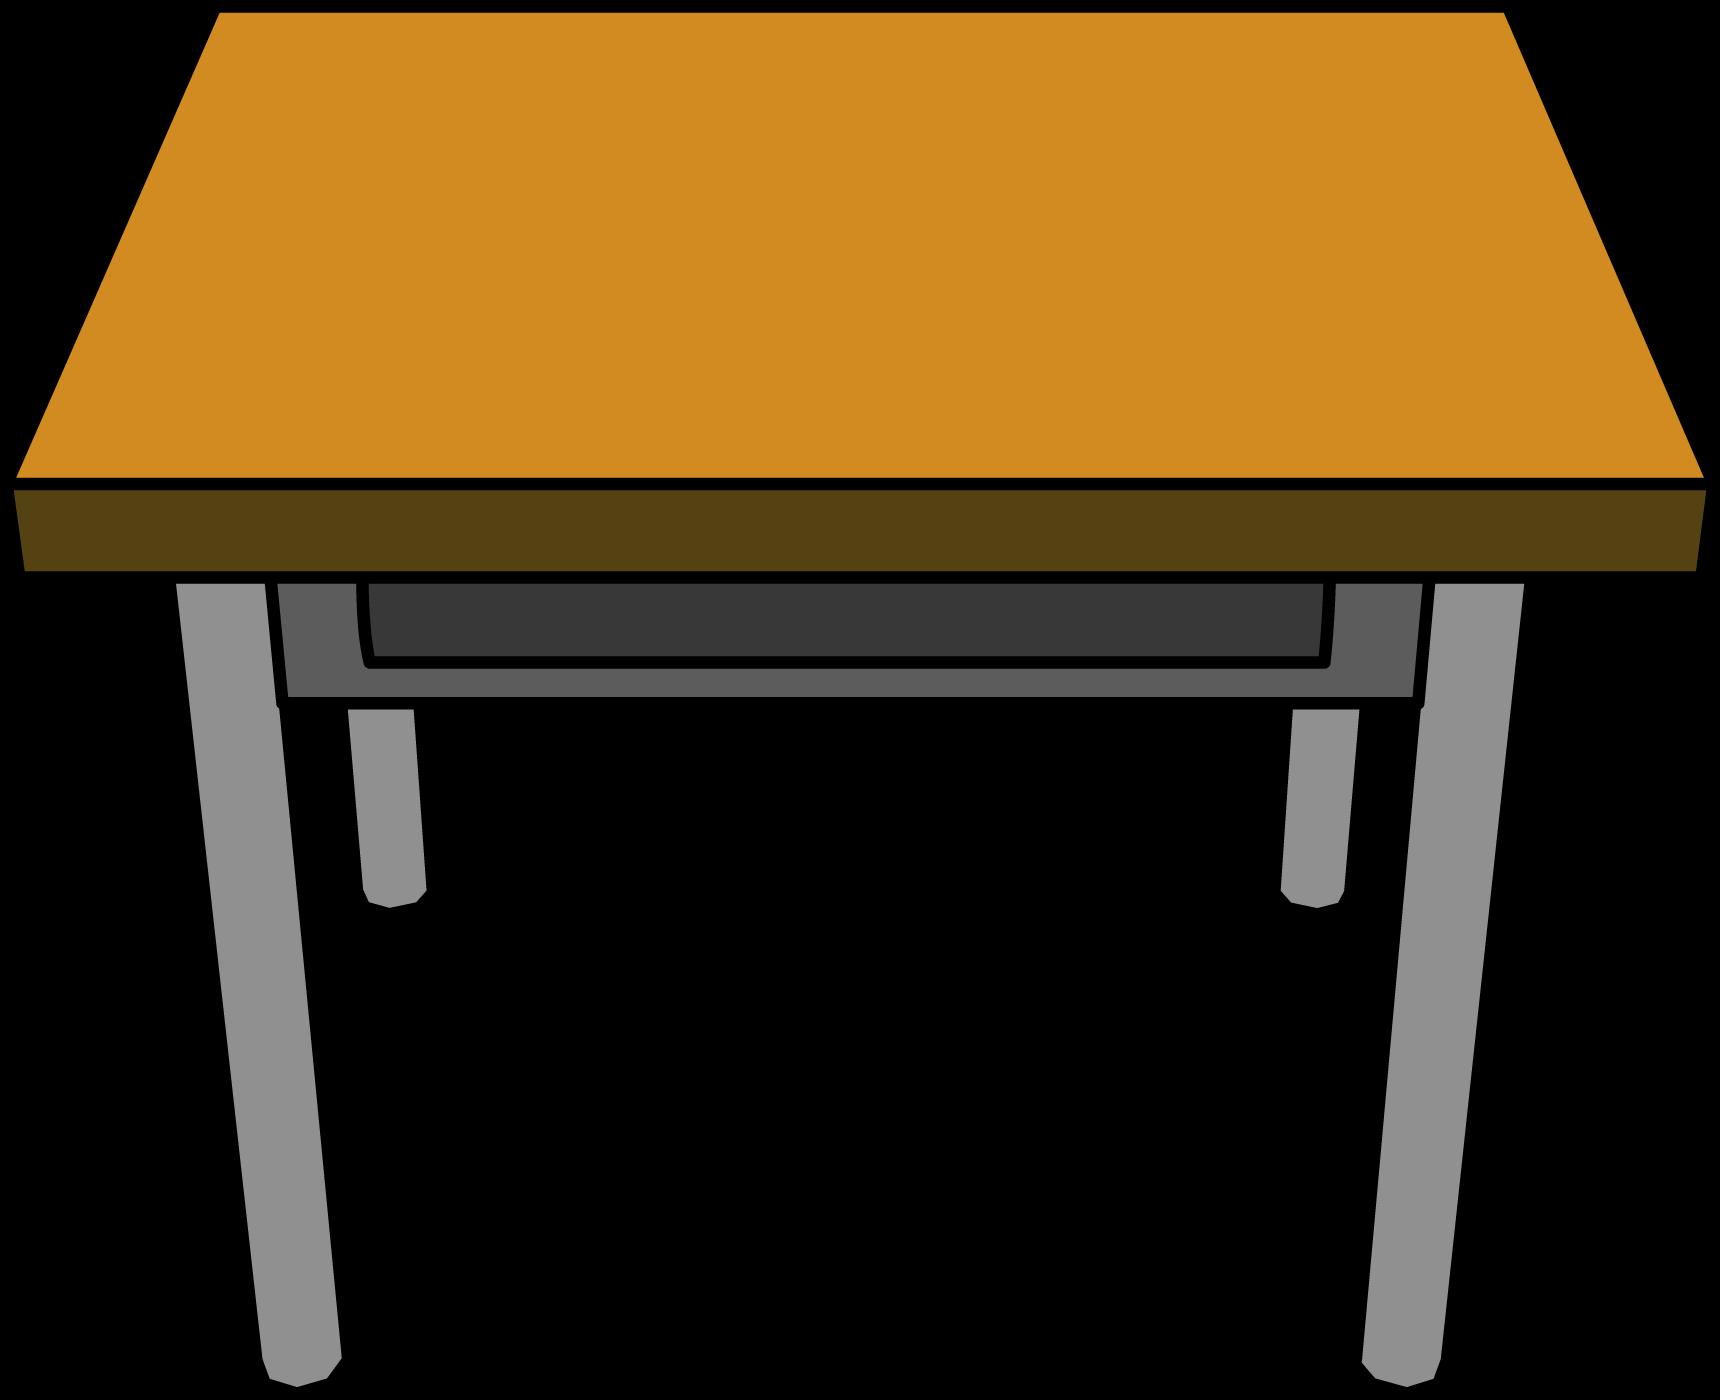 Classroom Desk Clipart-Classroom Desk Clipart-1